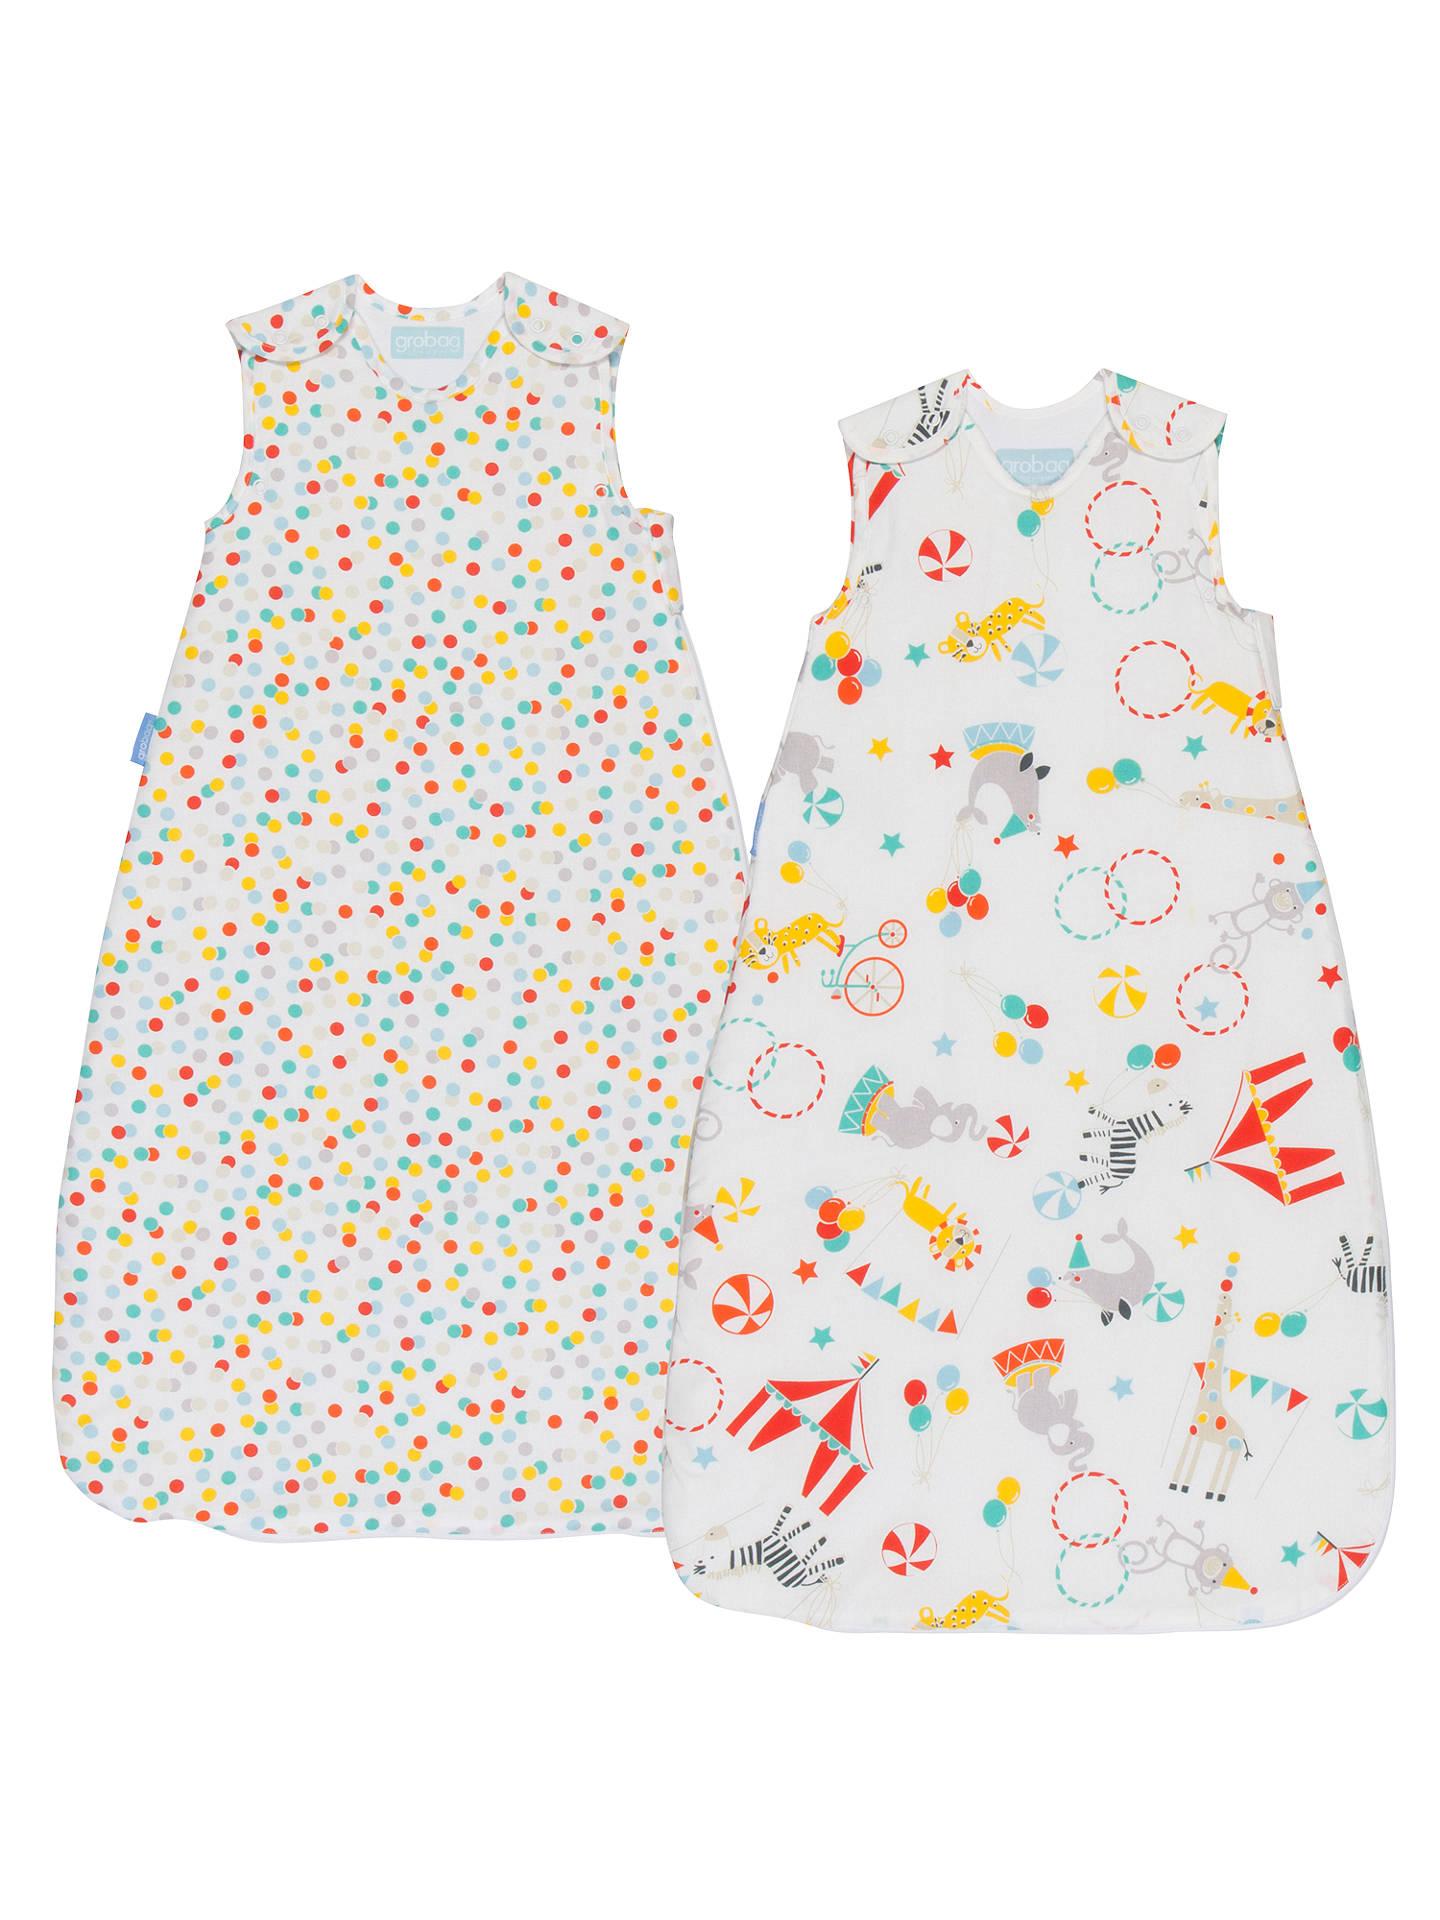 Sleeping Bags & Sleepsacks Nursery Bedding Set Of 3 Grobag Sleepy Circus 18-36 Months 1 Tog Spring/summer